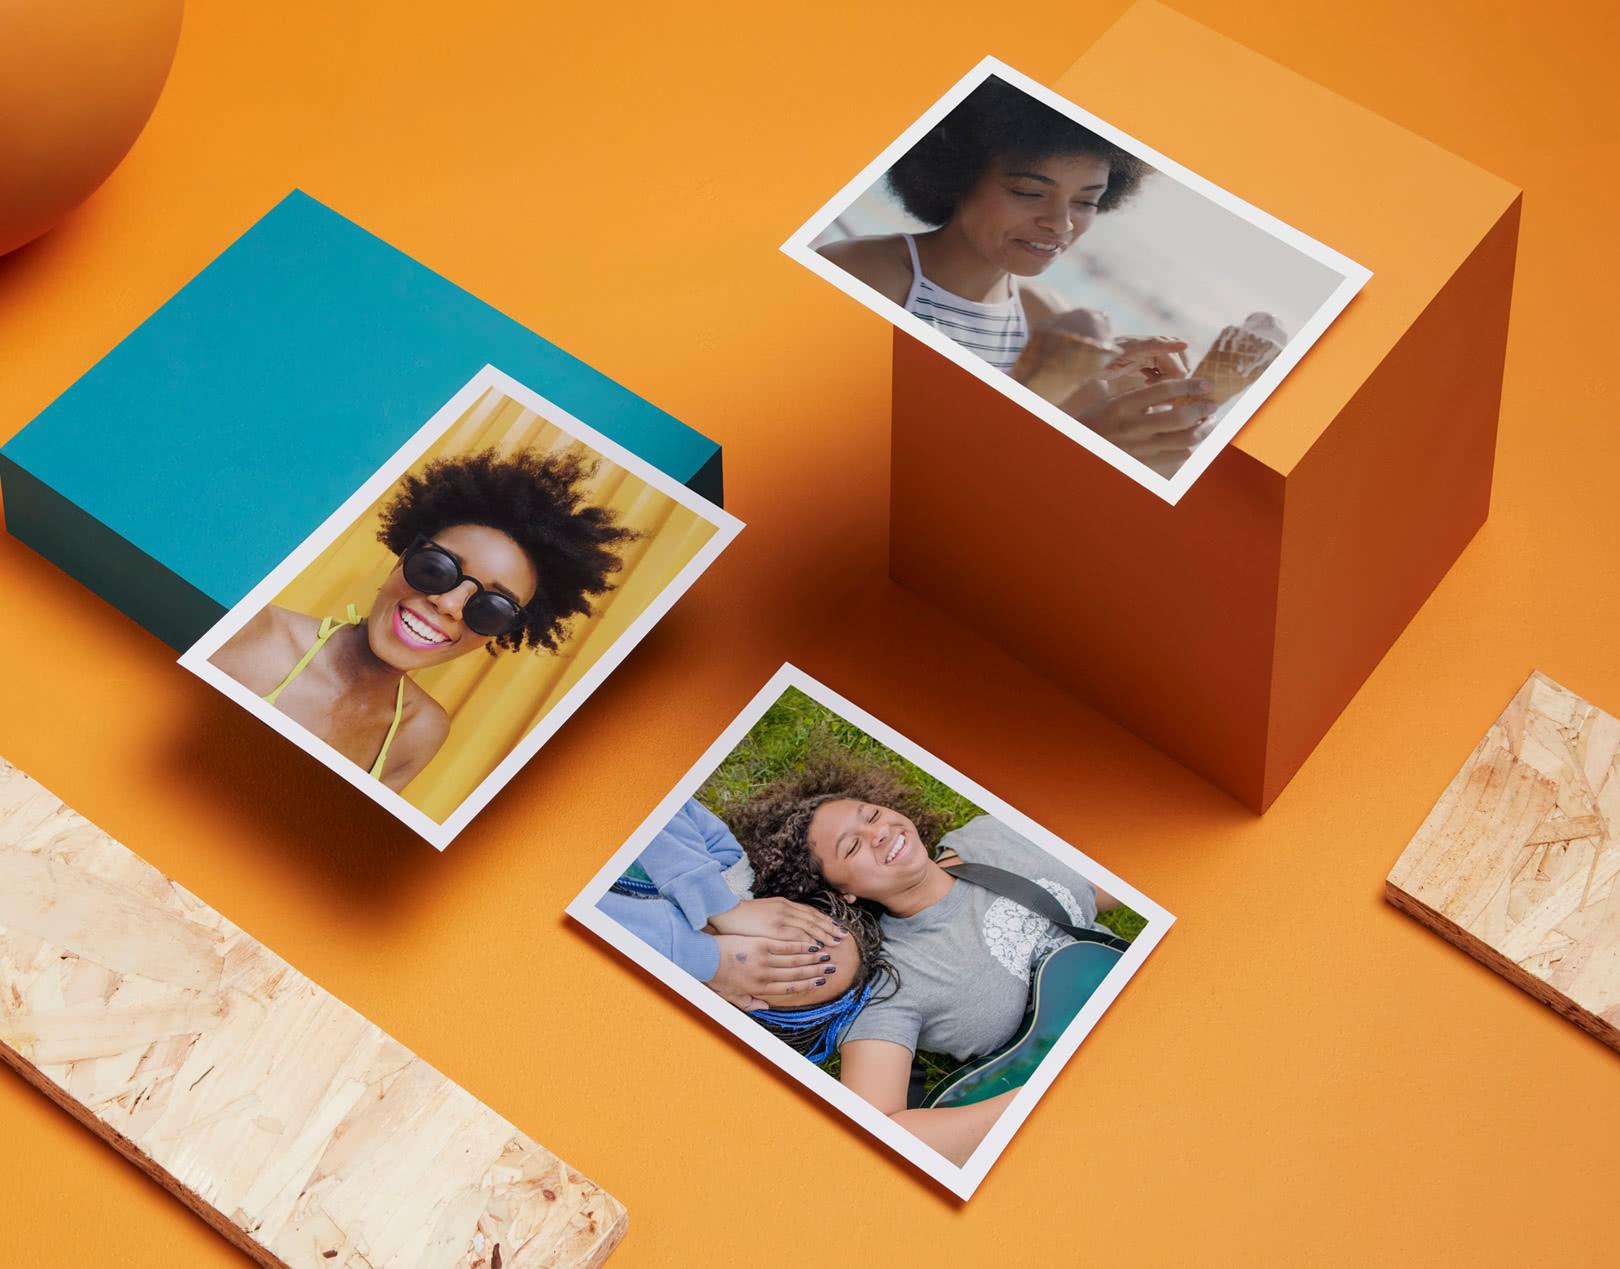 Standard 6x4 Photo Prints